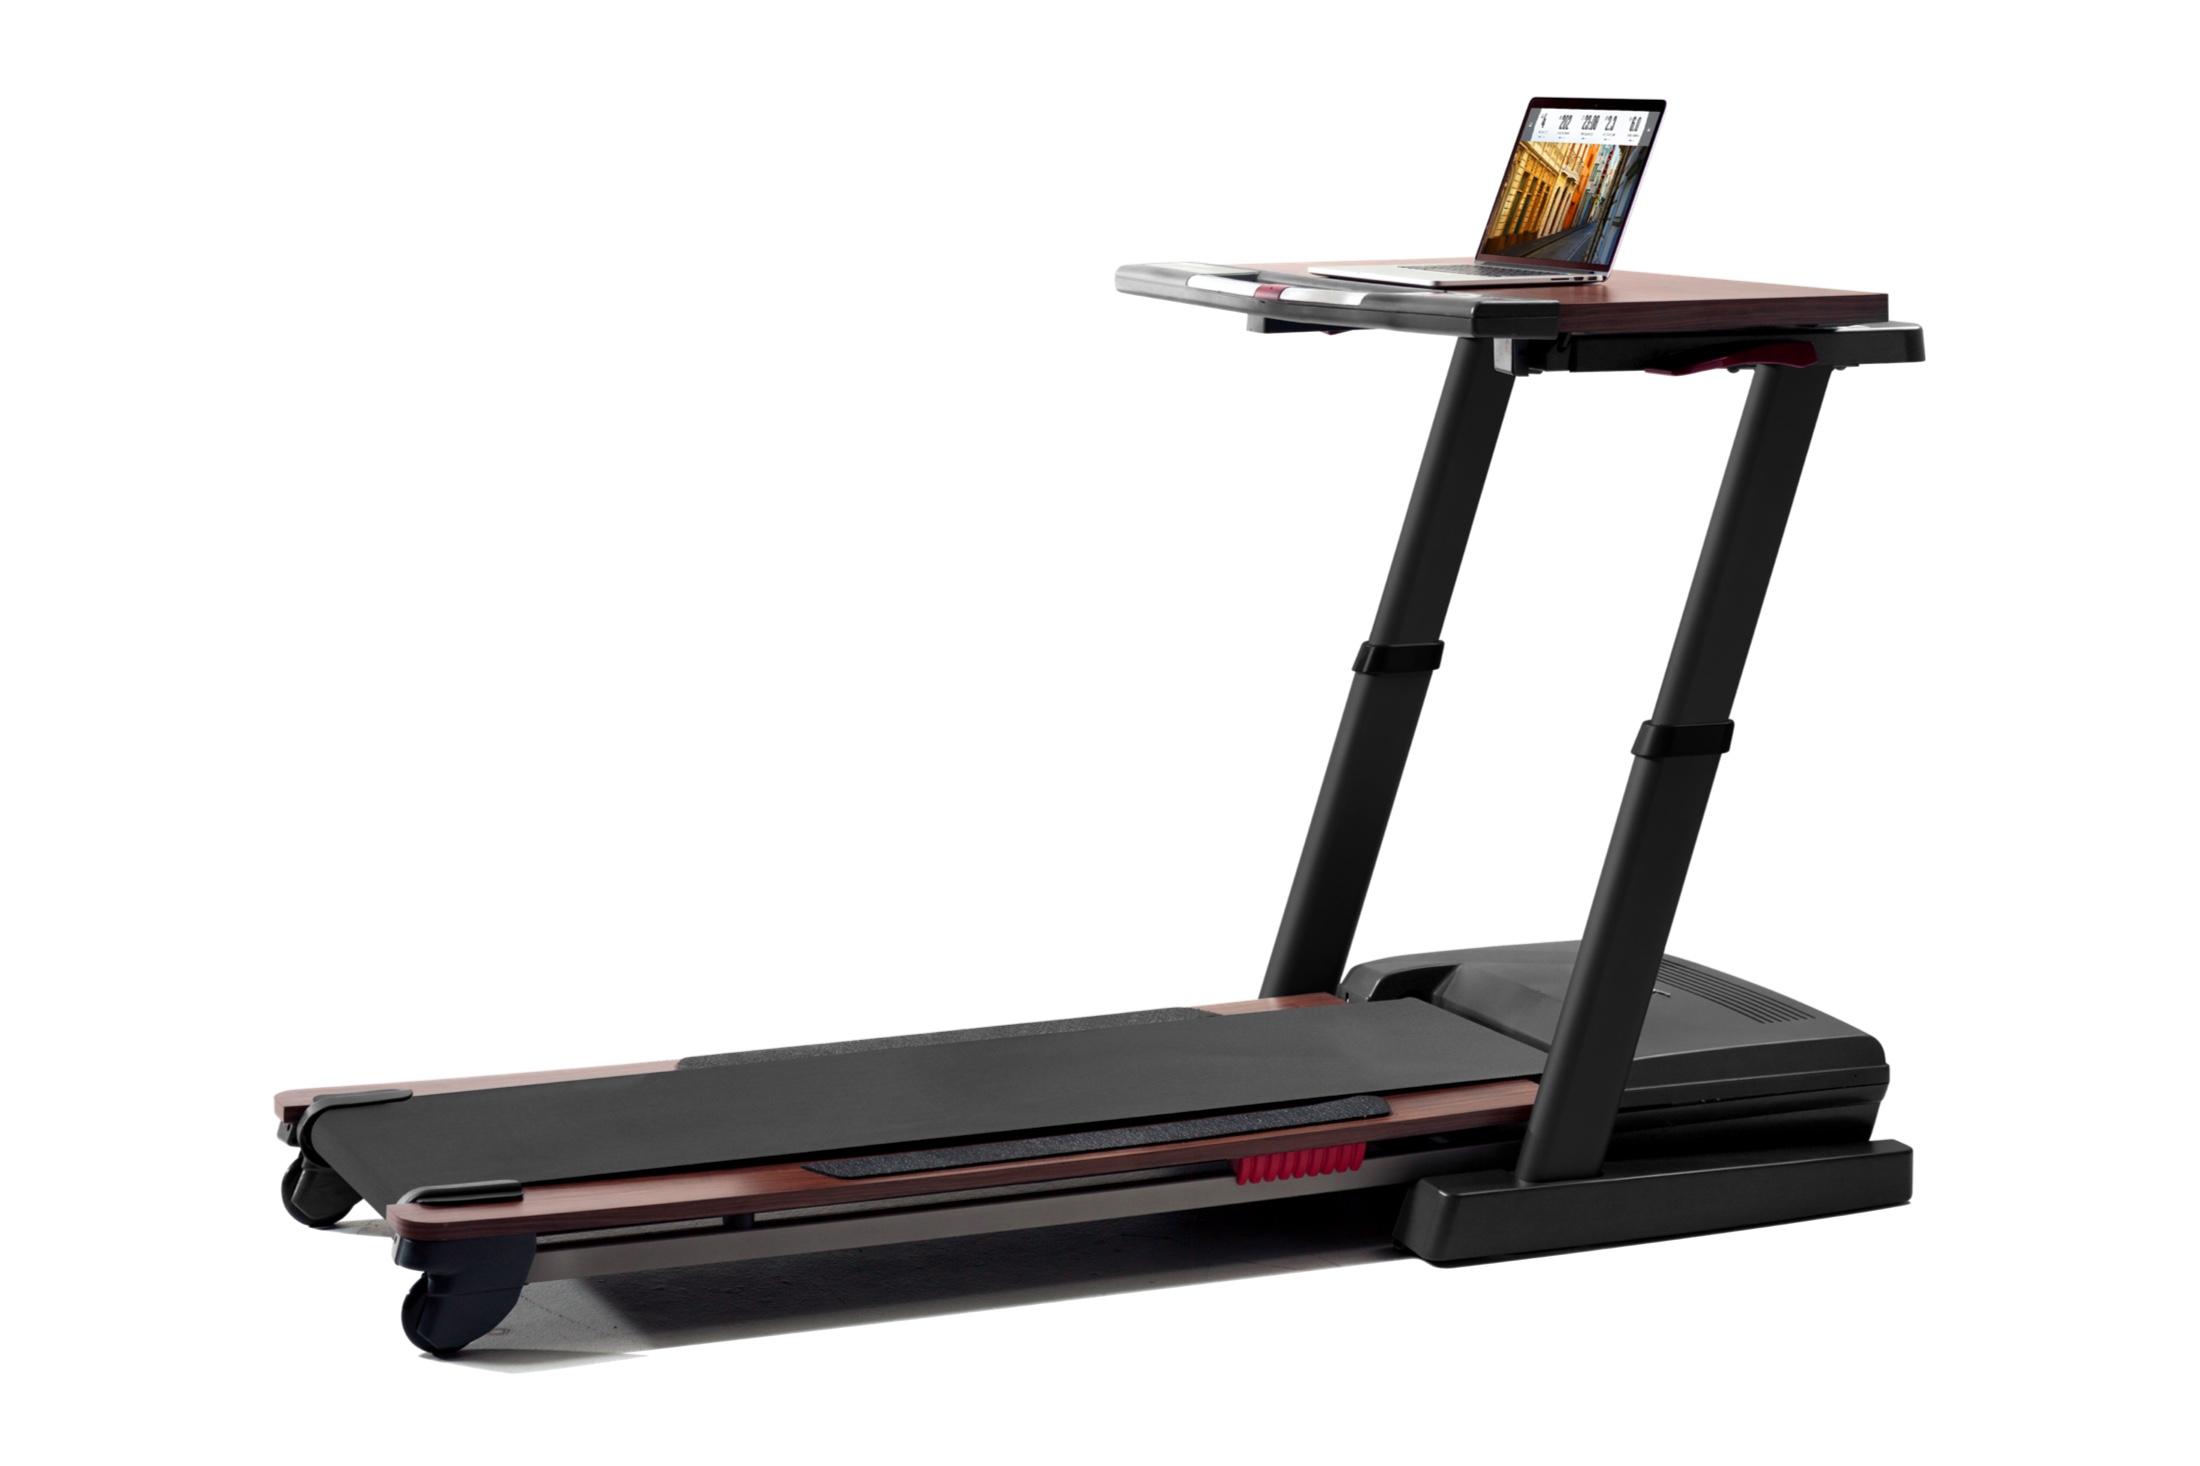 NordicTrack Treadmill Desk Platinum gallery image 1